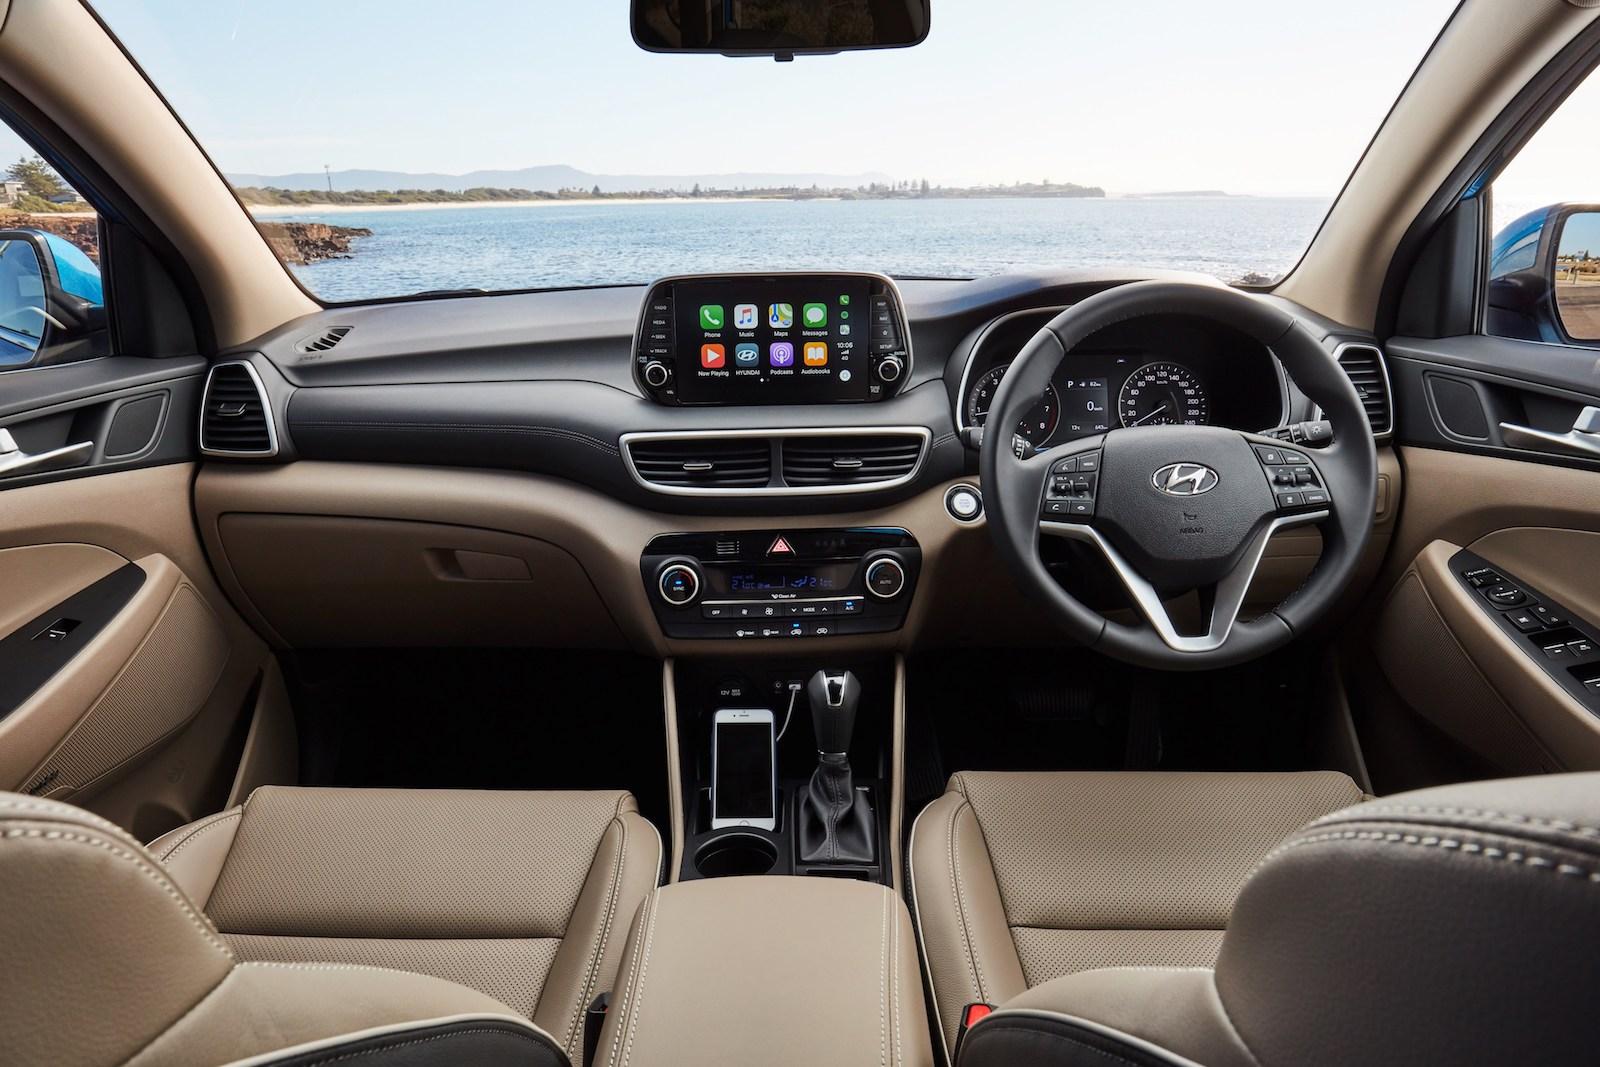 2019 hyundai tucson now on sale in australia from 28 150 - Hyundai tucson interior pictures ...